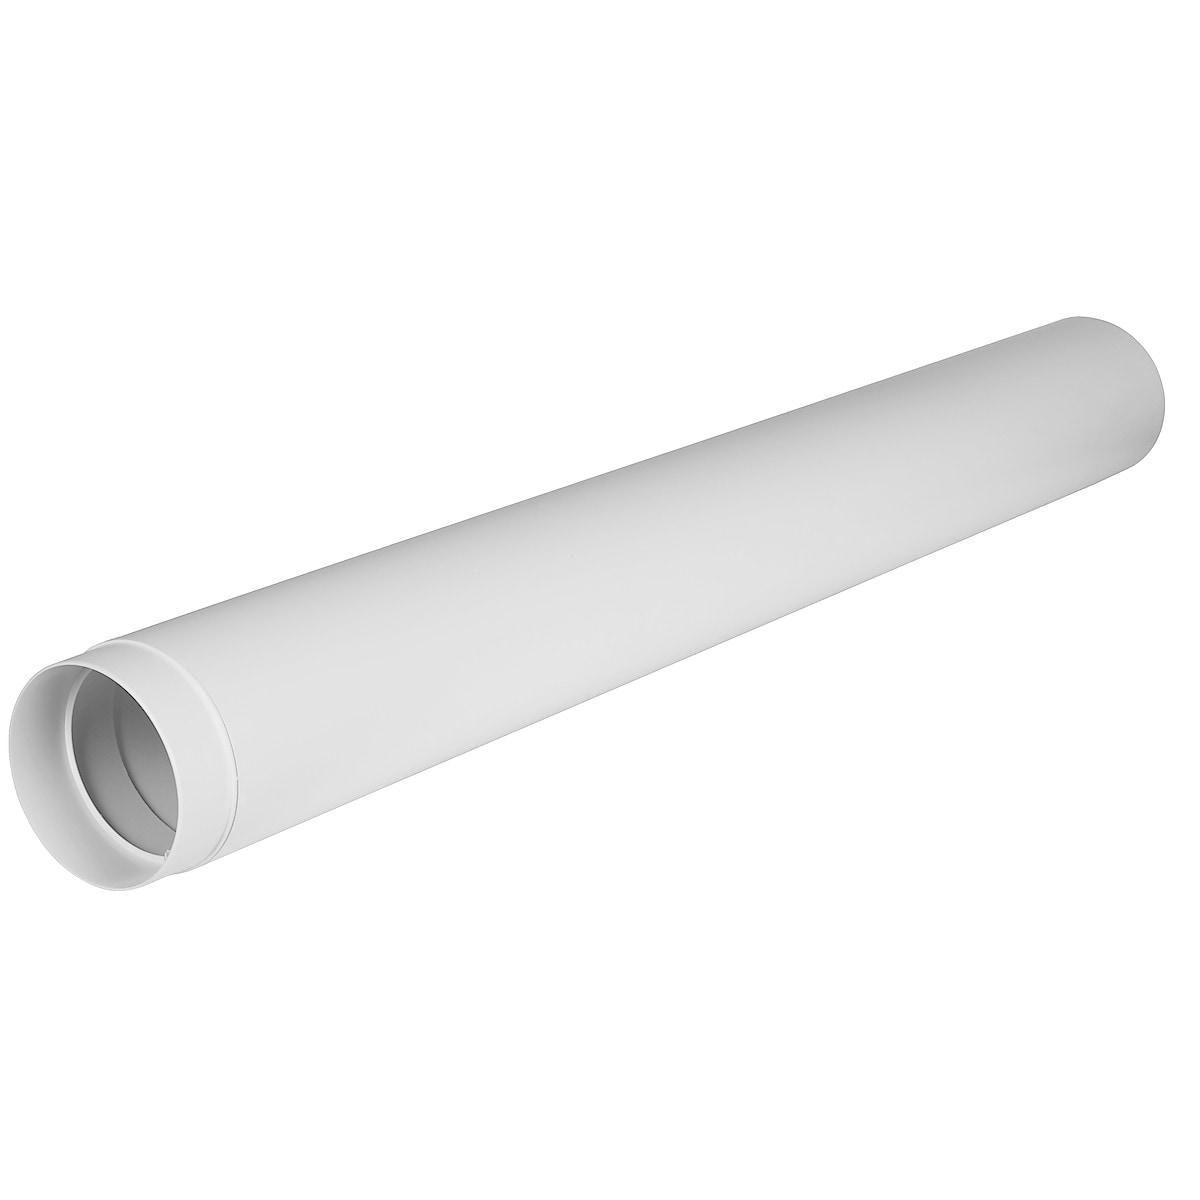 Ventilationskanal Flexit RK 100